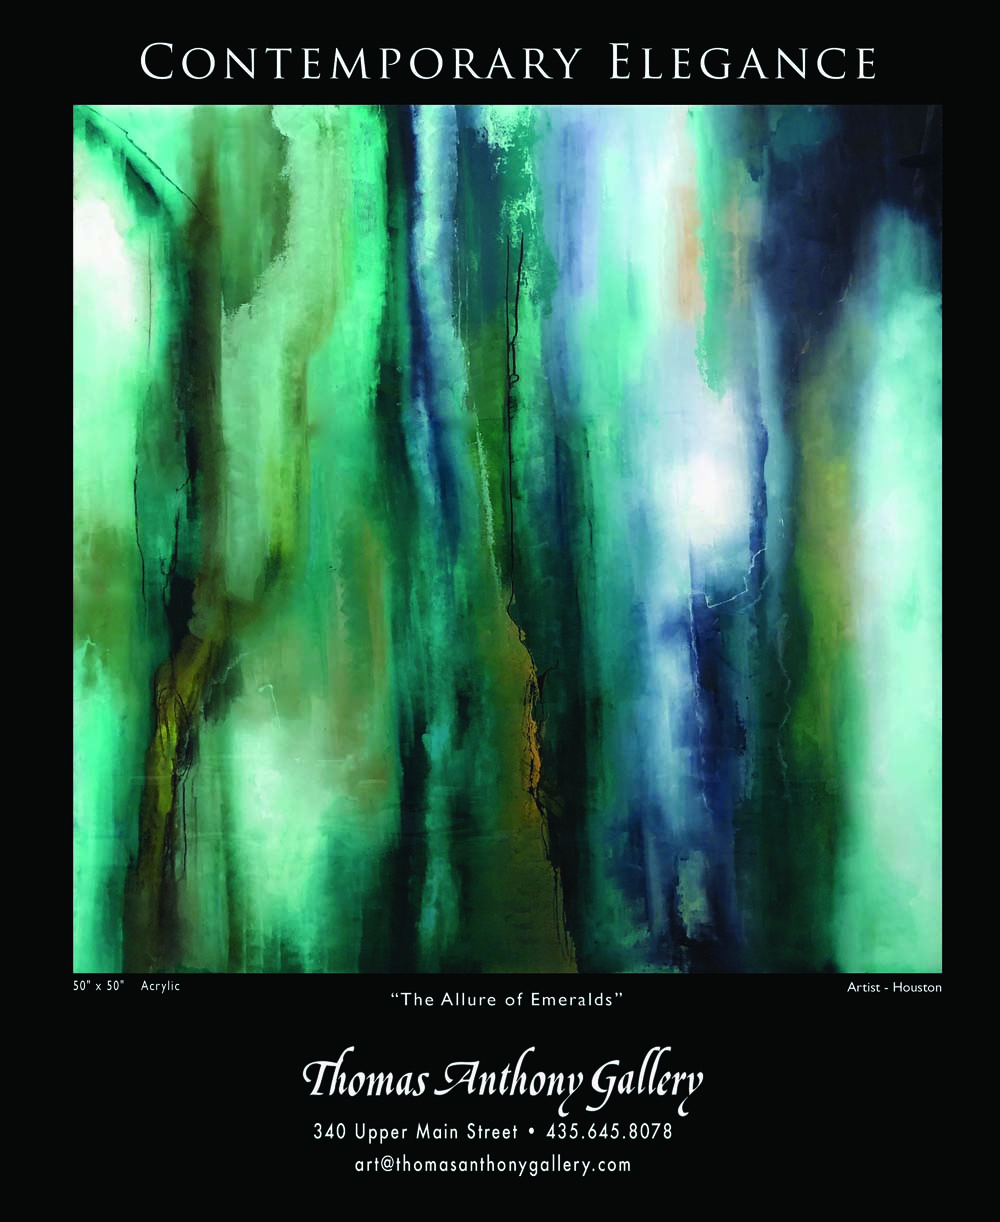 Thomas Anthony Gallery